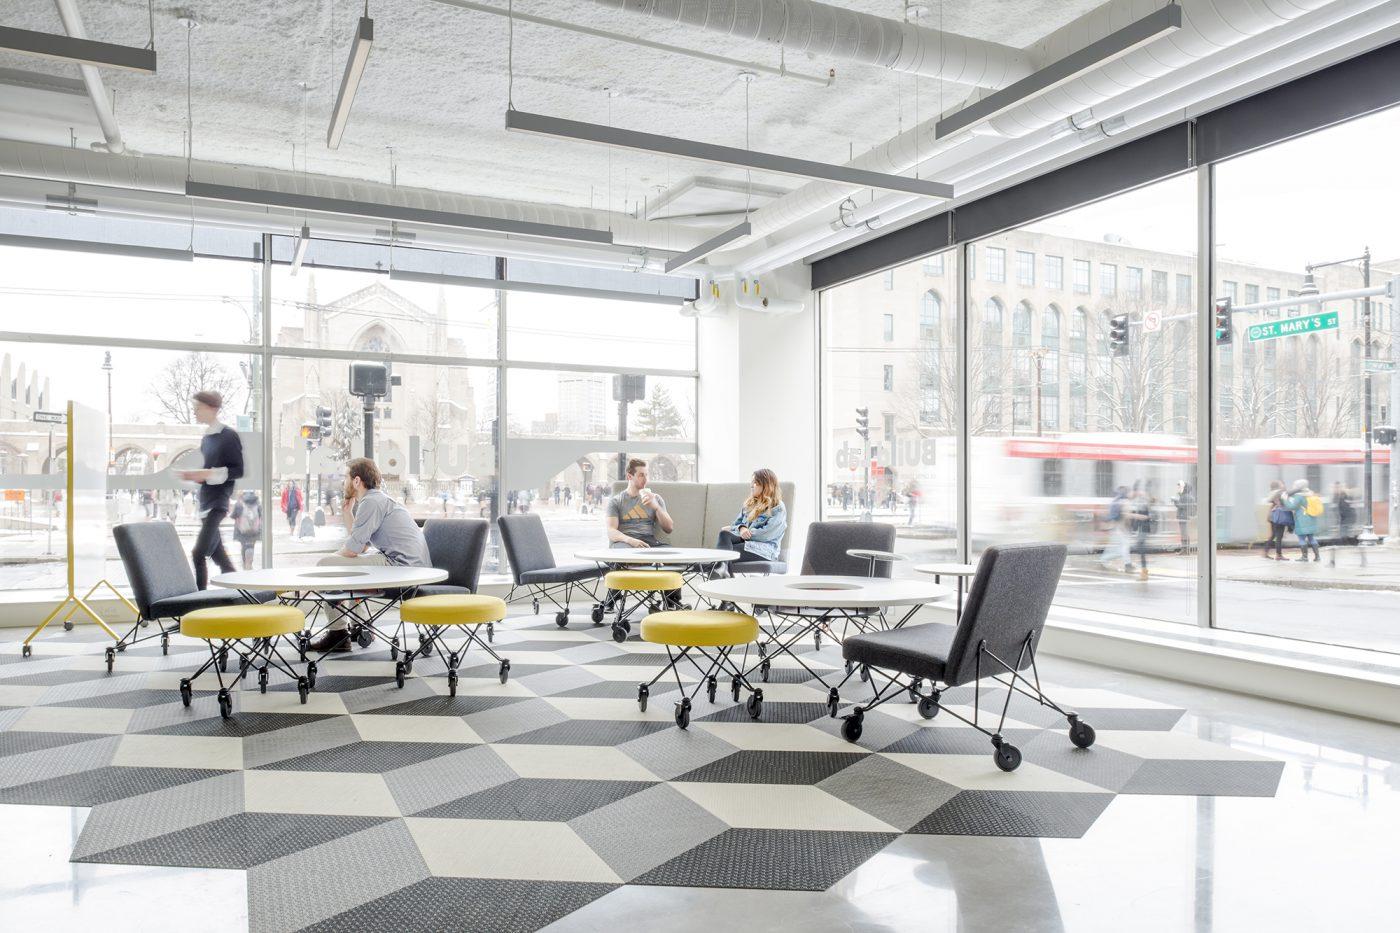 boston university build lab utile architecture planning